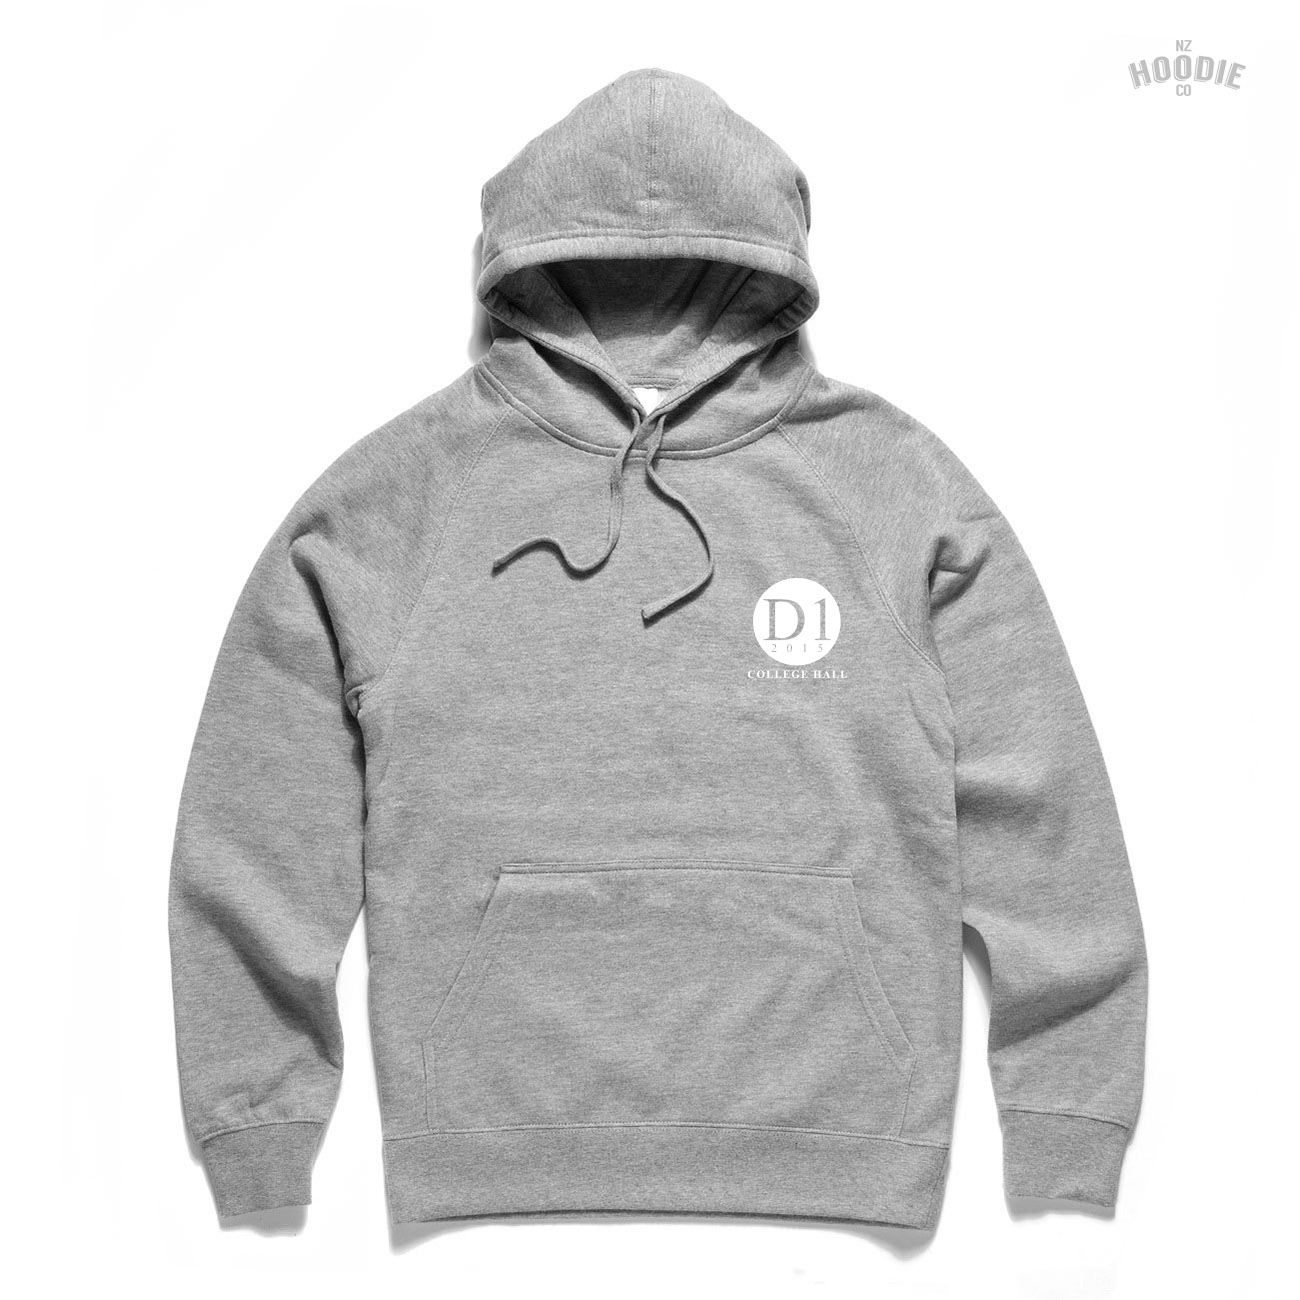 college-hall-d1-hoodie-grey-front.jpg